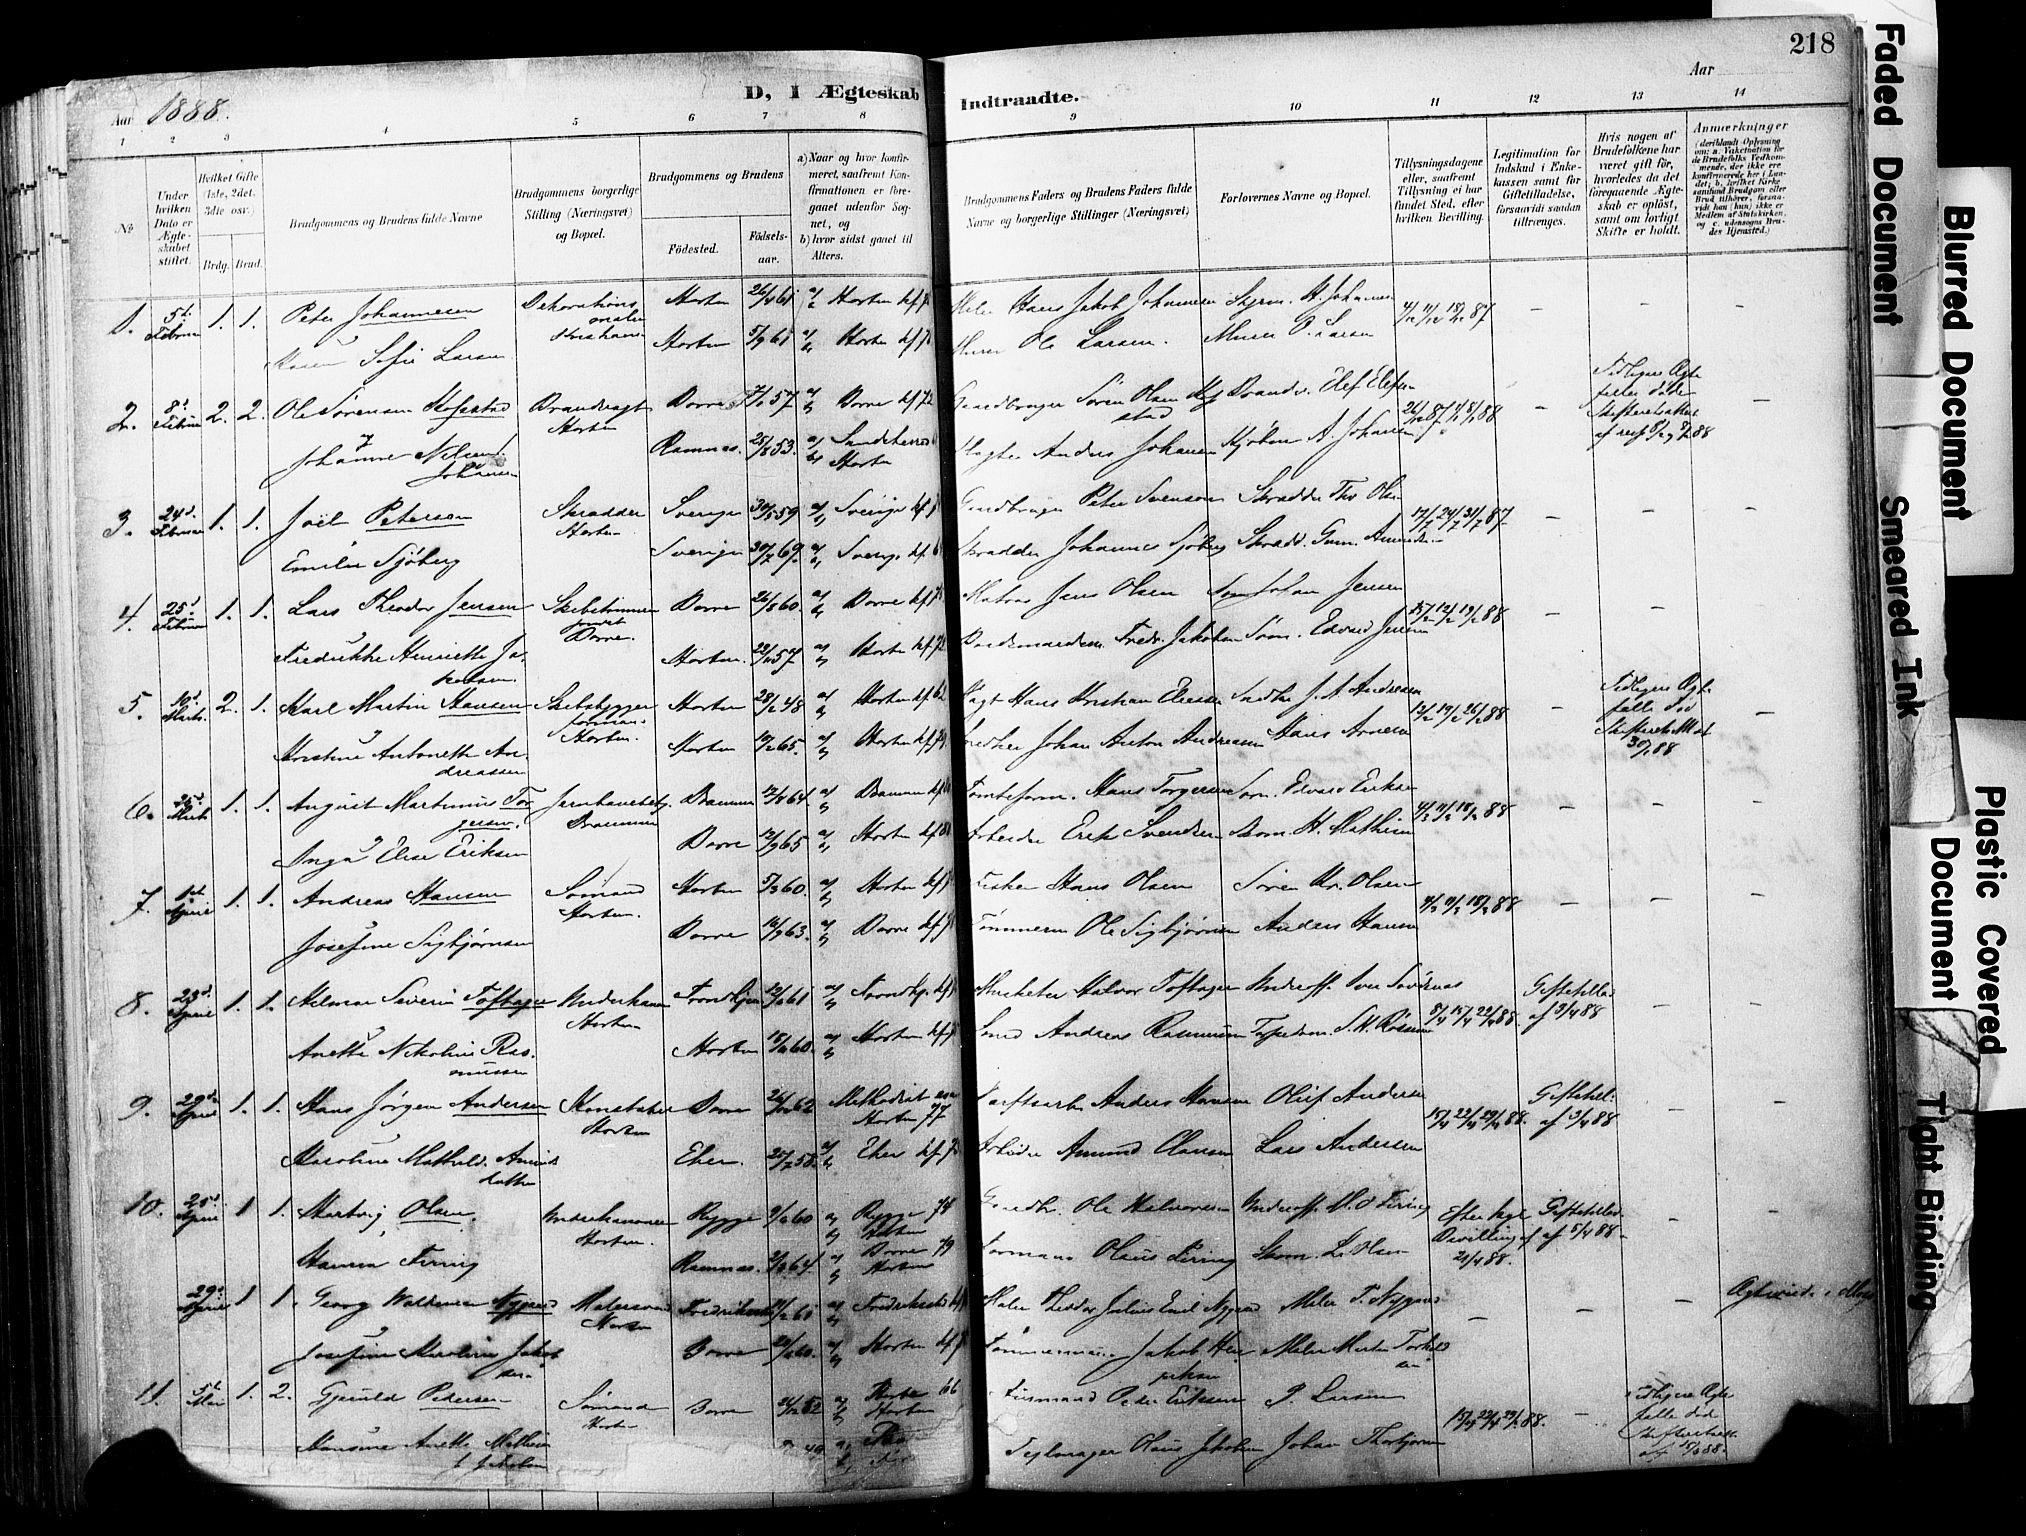 SAKO, Horten kirkebøker, F/Fa/L0004: Parish register (official) no. 4, 1888-1895, p. 218